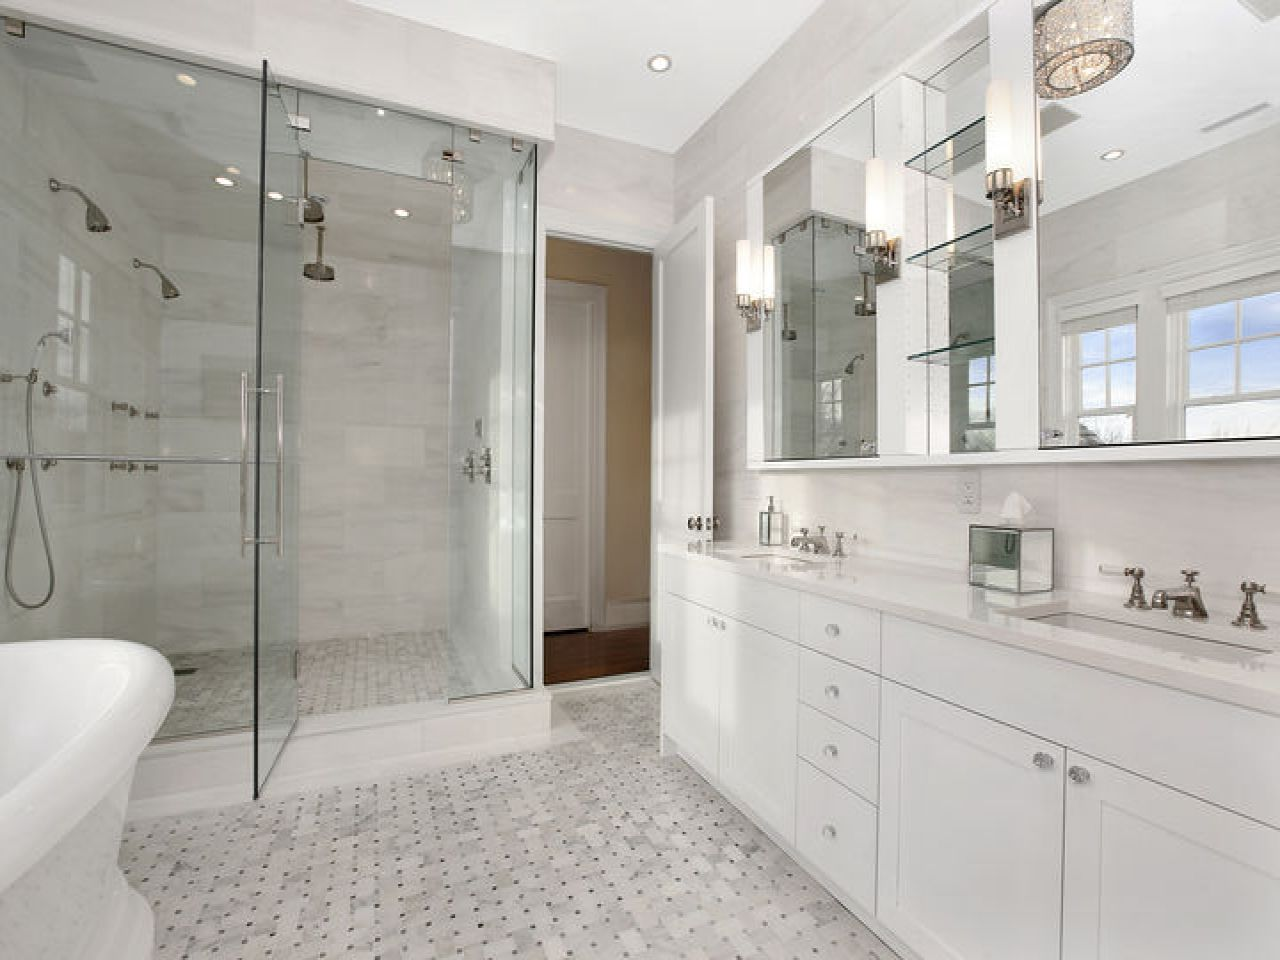 Feminine Bathrooms White Marble Master Bathroom Design Ideas White Marble Bathrooms White Master Bathroom Marble Bathroom Designs